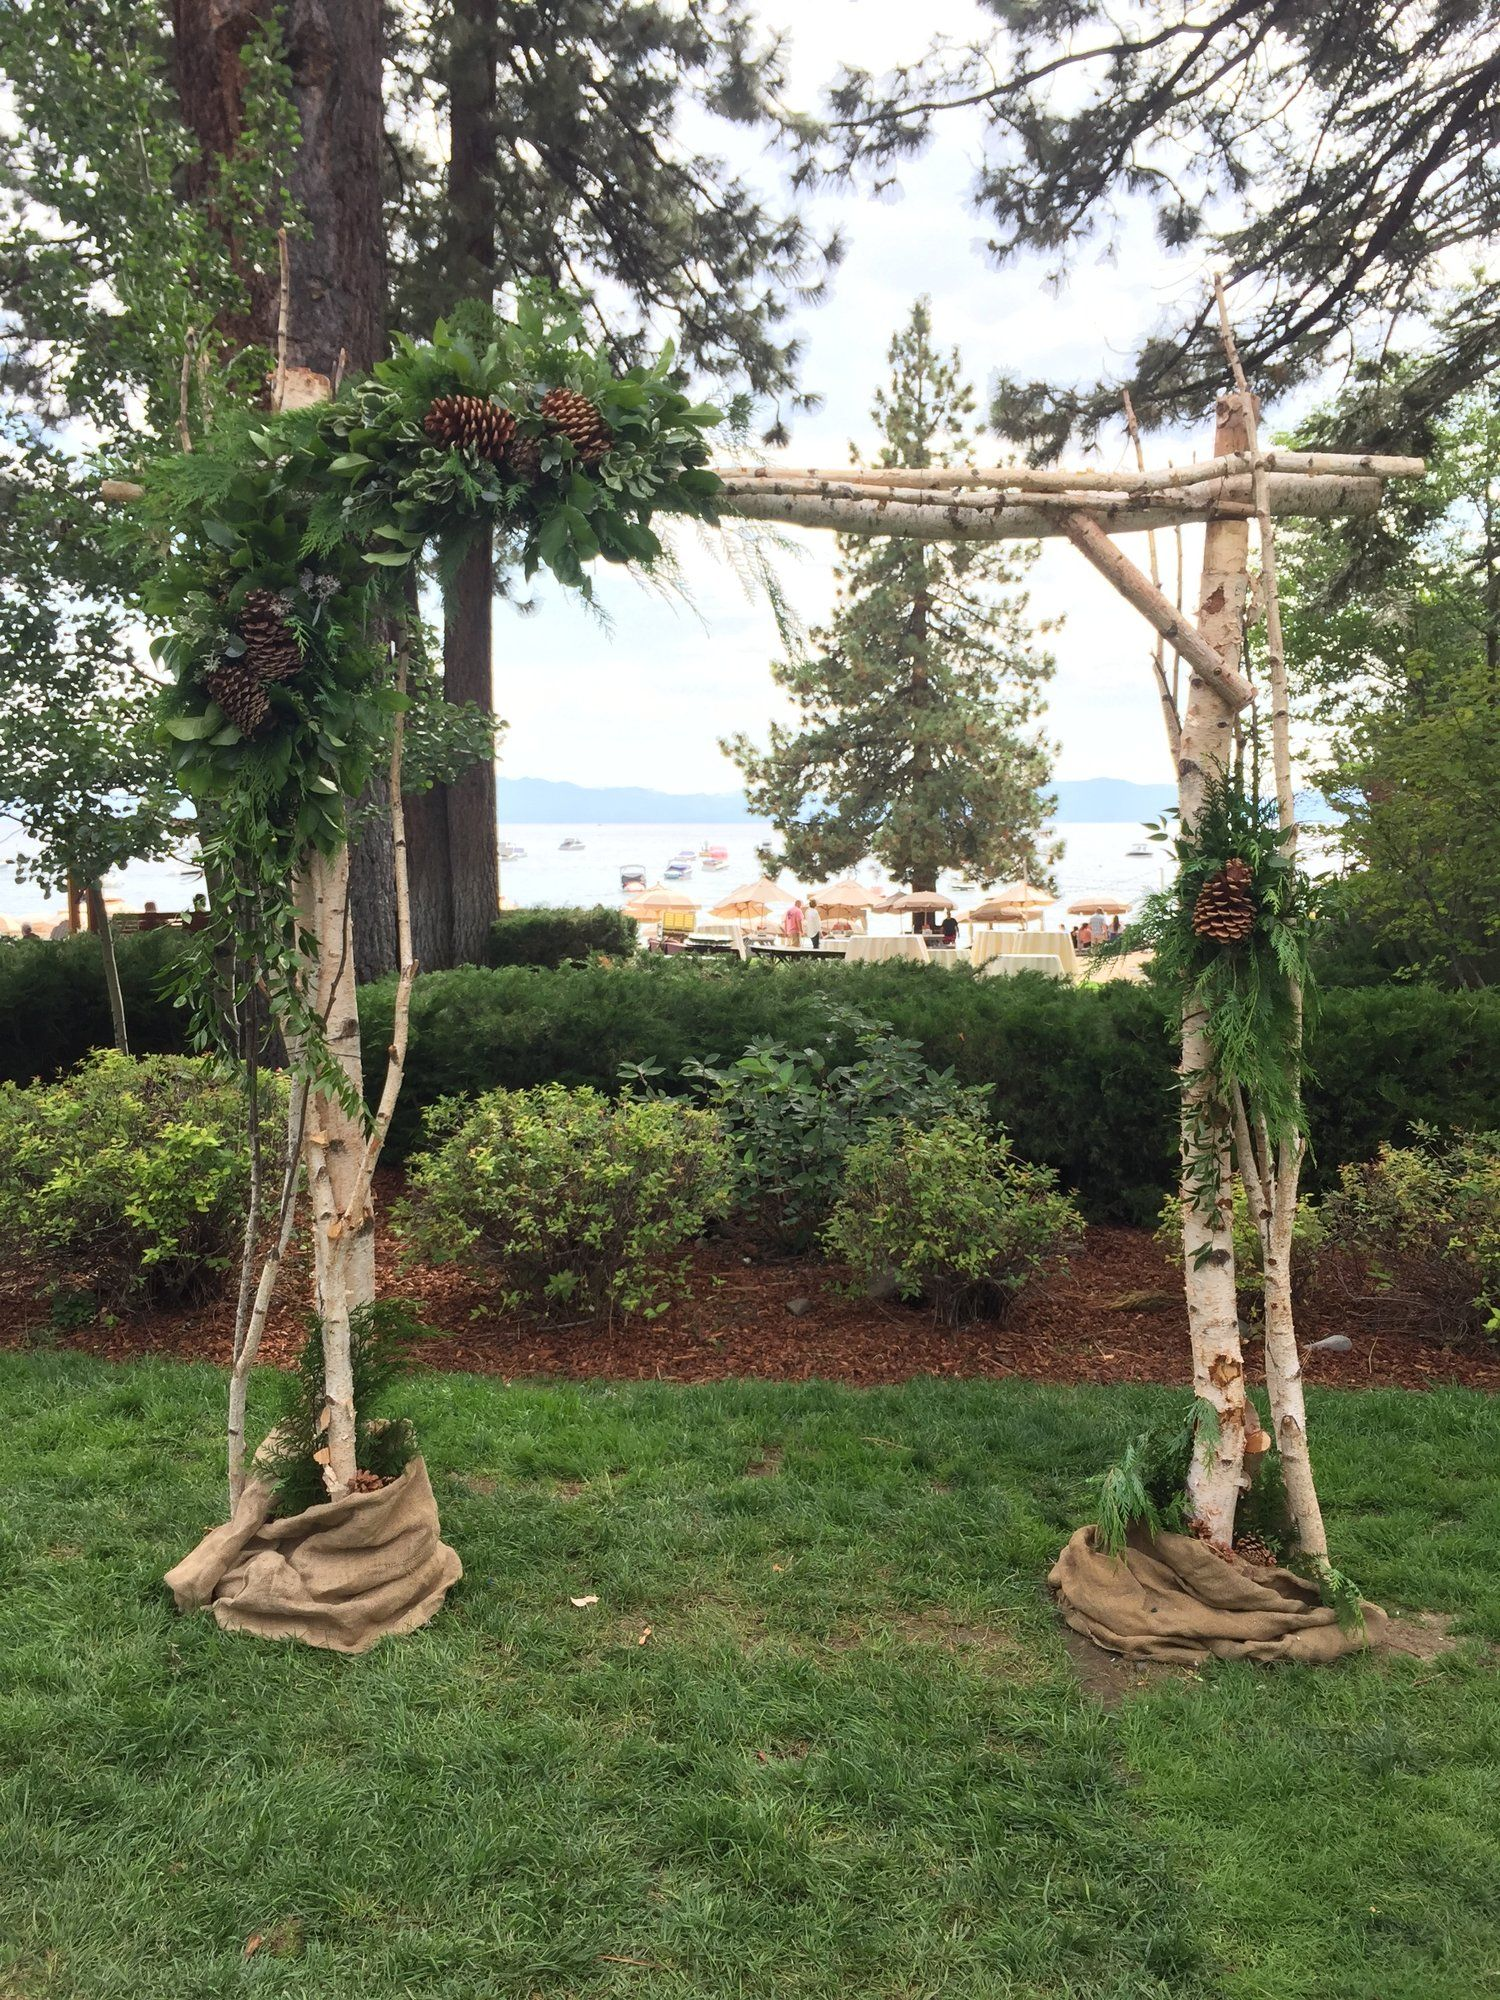 Arches birch arbor in 2020 fall wedding arches